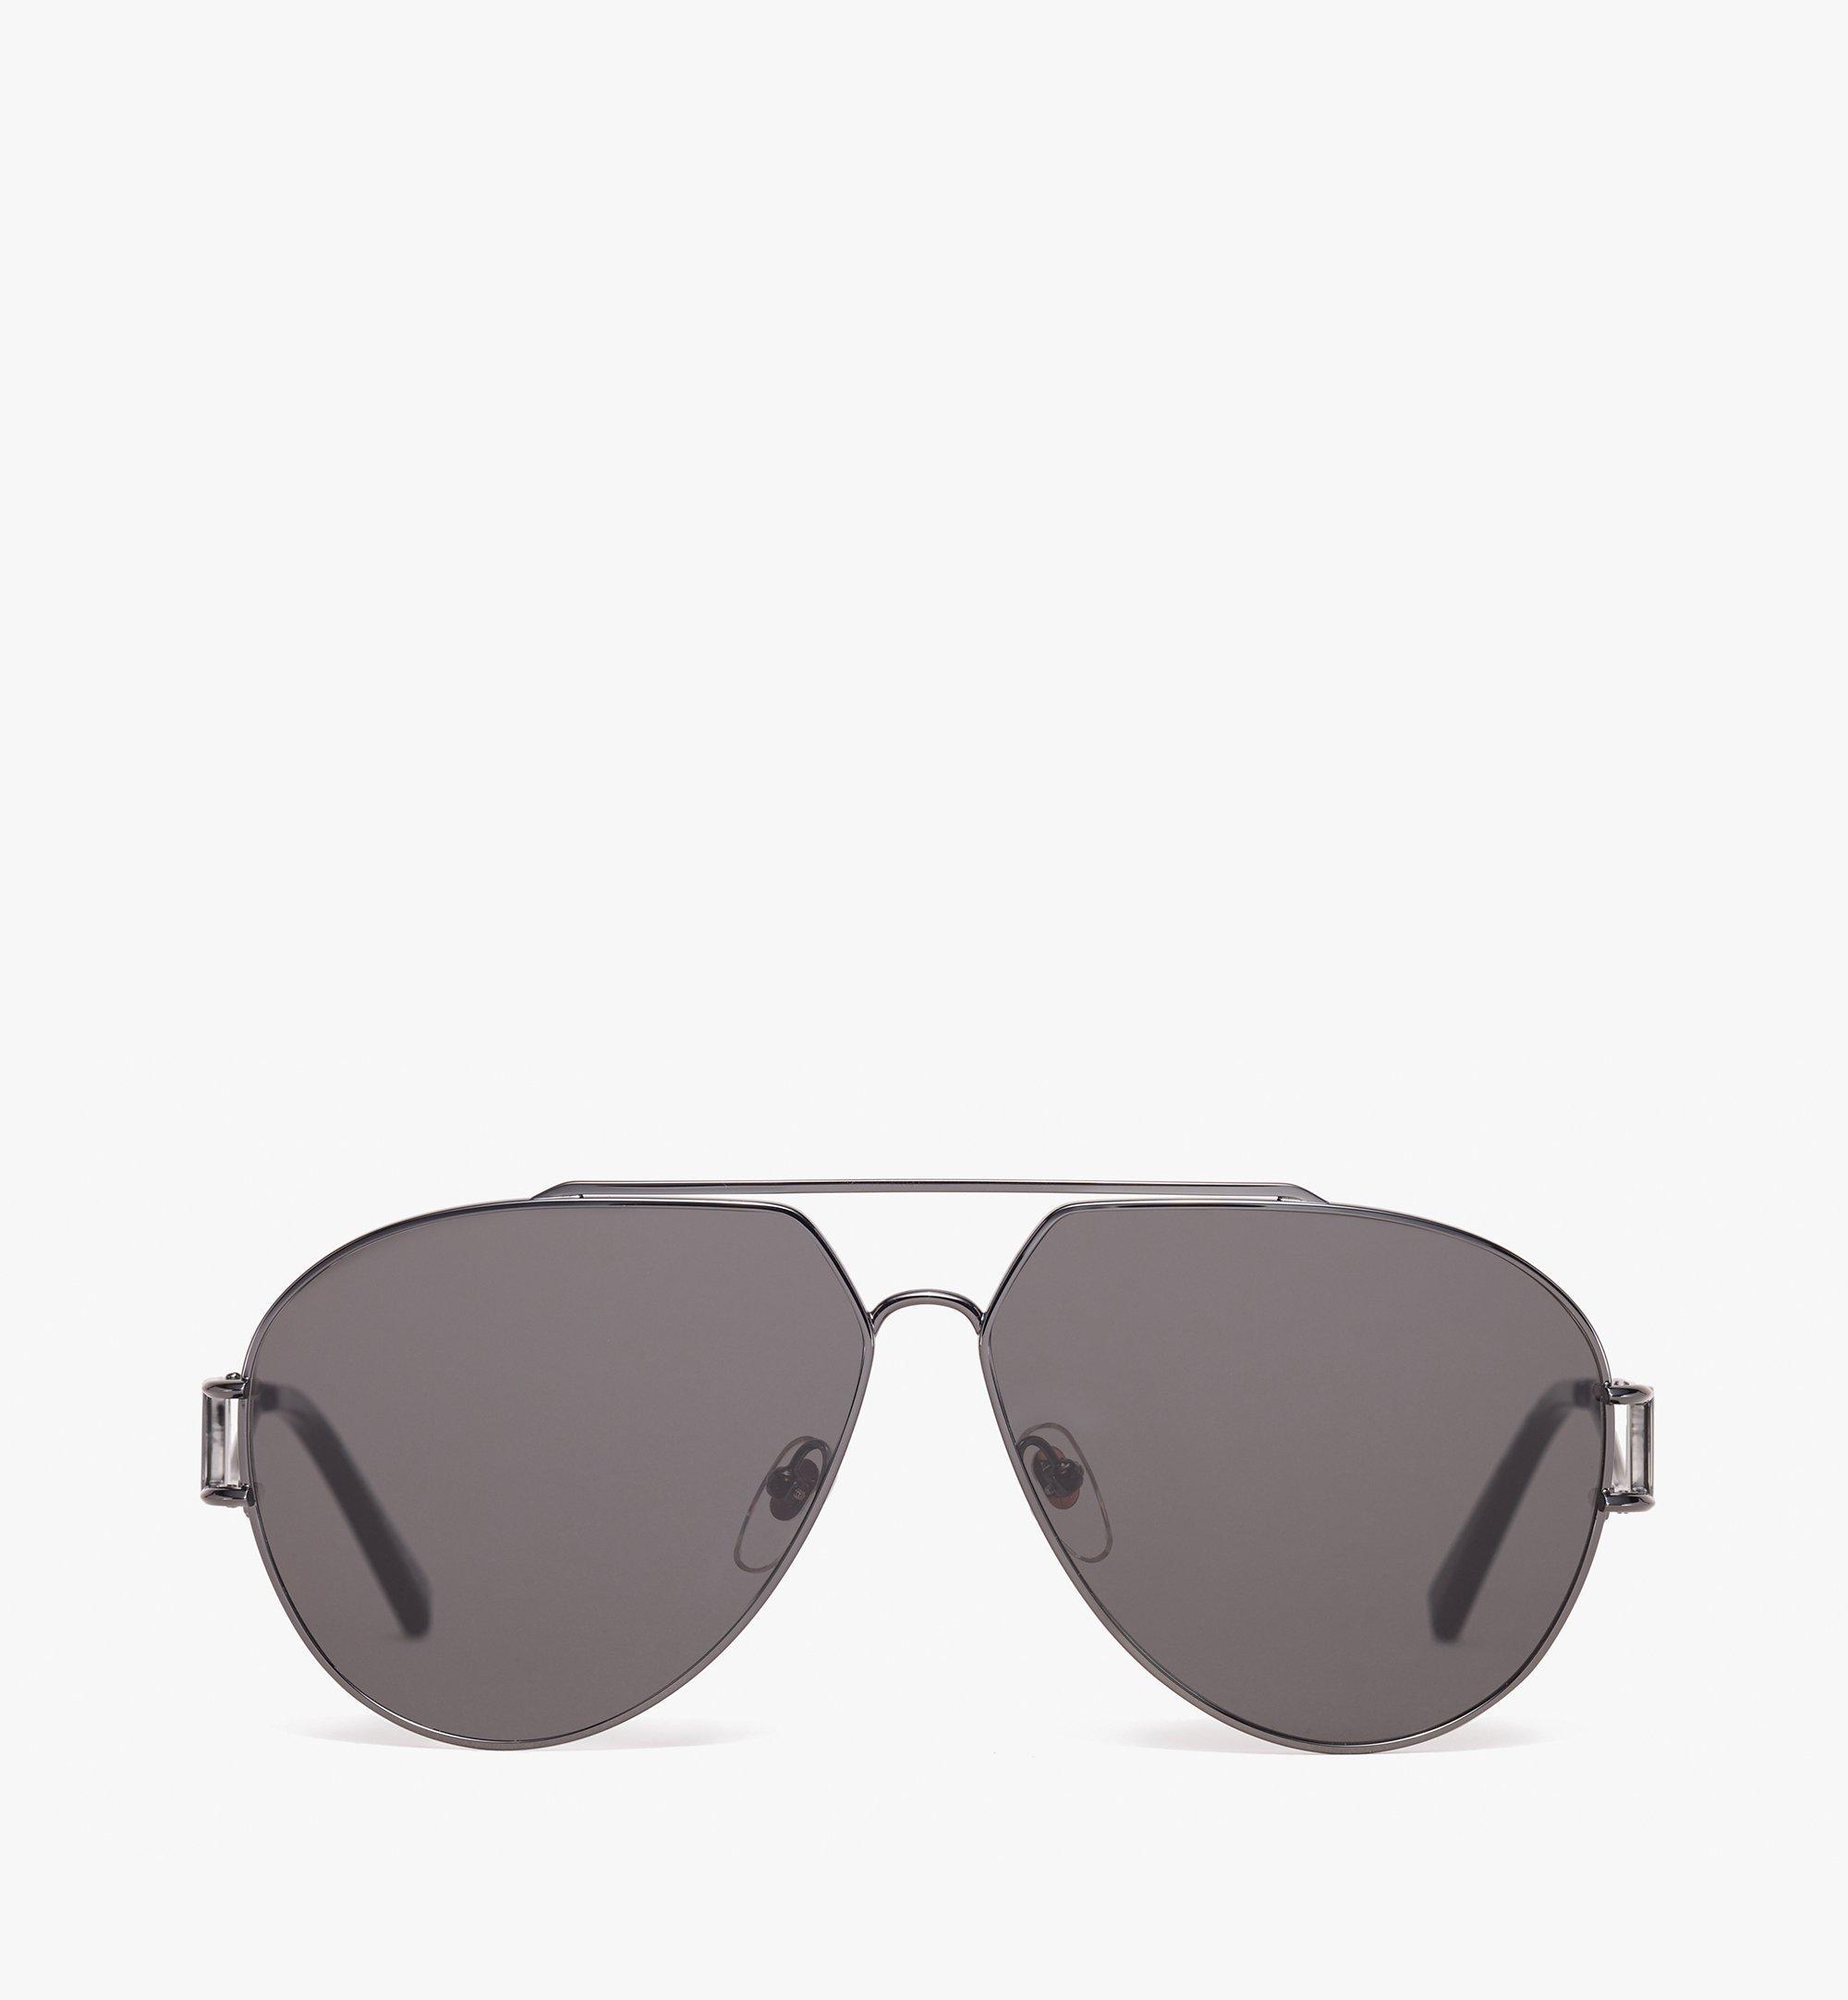 MCM Aviator Sunglasses Grey MEG9A2I04EG001 Alternate View 1